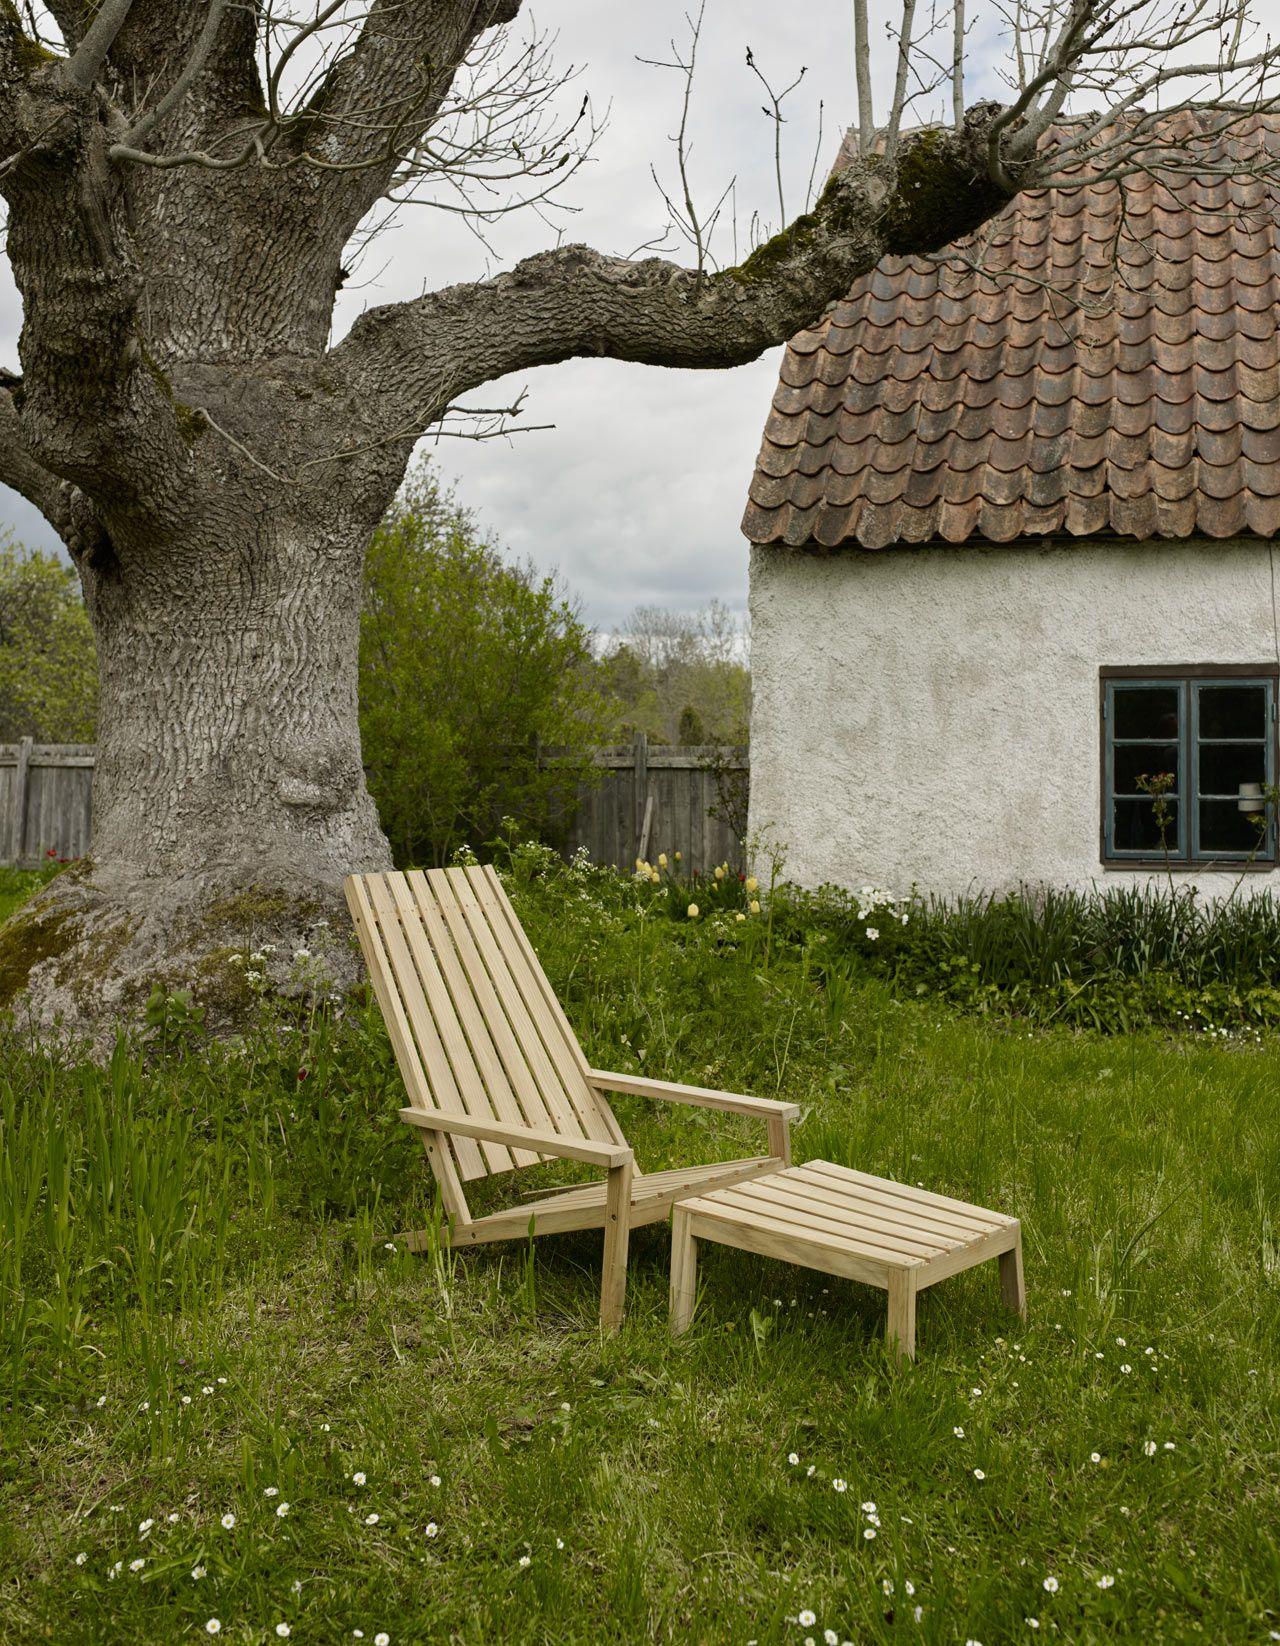 New Wooden Outdoor Furniture from Skagerak Outdoor